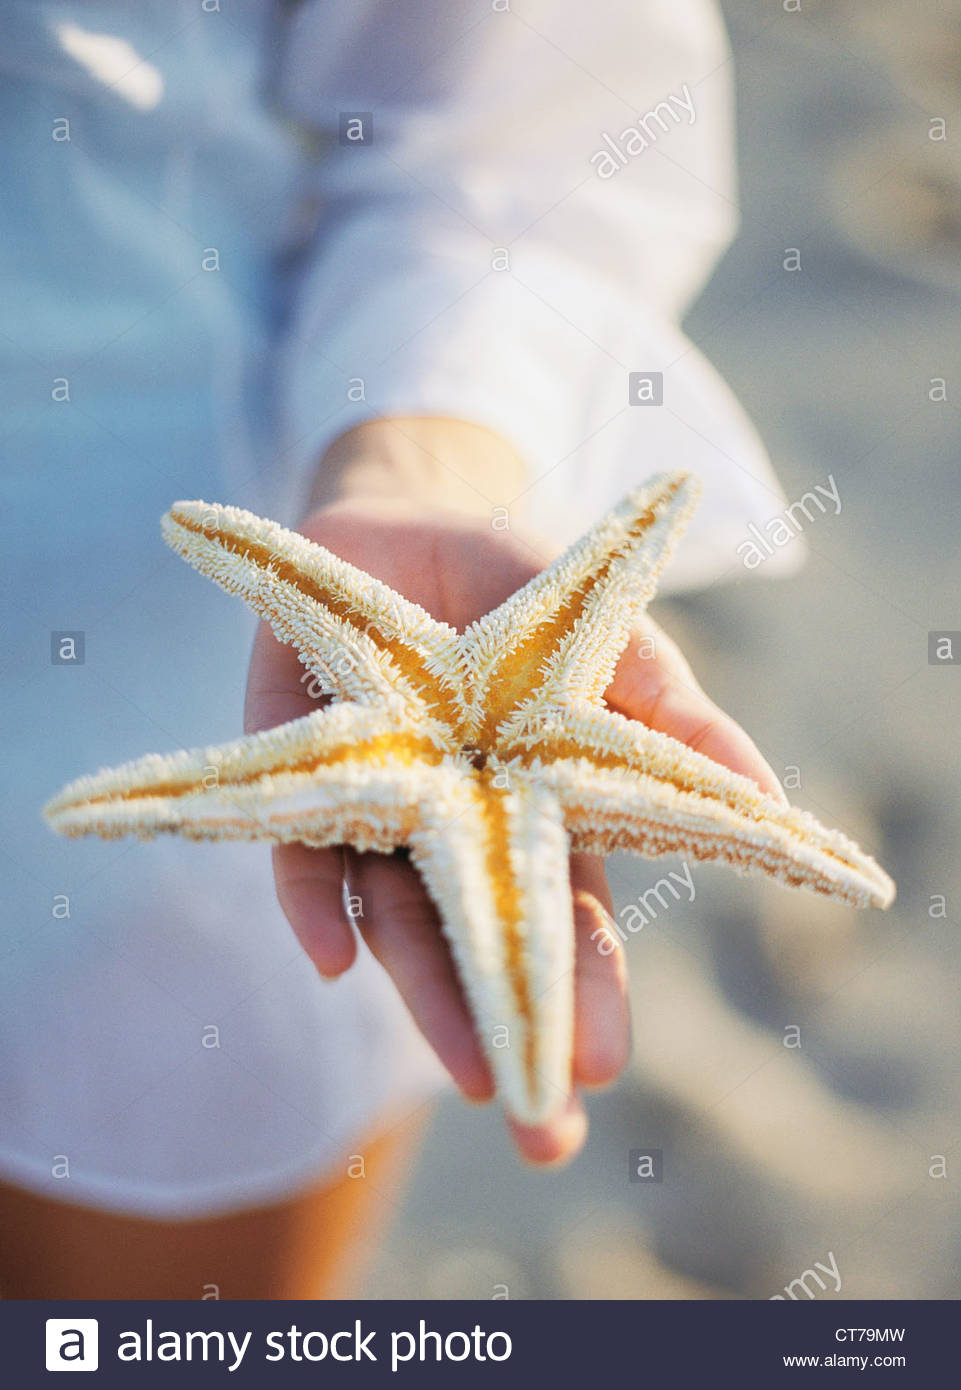 Starfish Anatomy Stock Photos & Starfish Anatomy Stock Images - Alamy